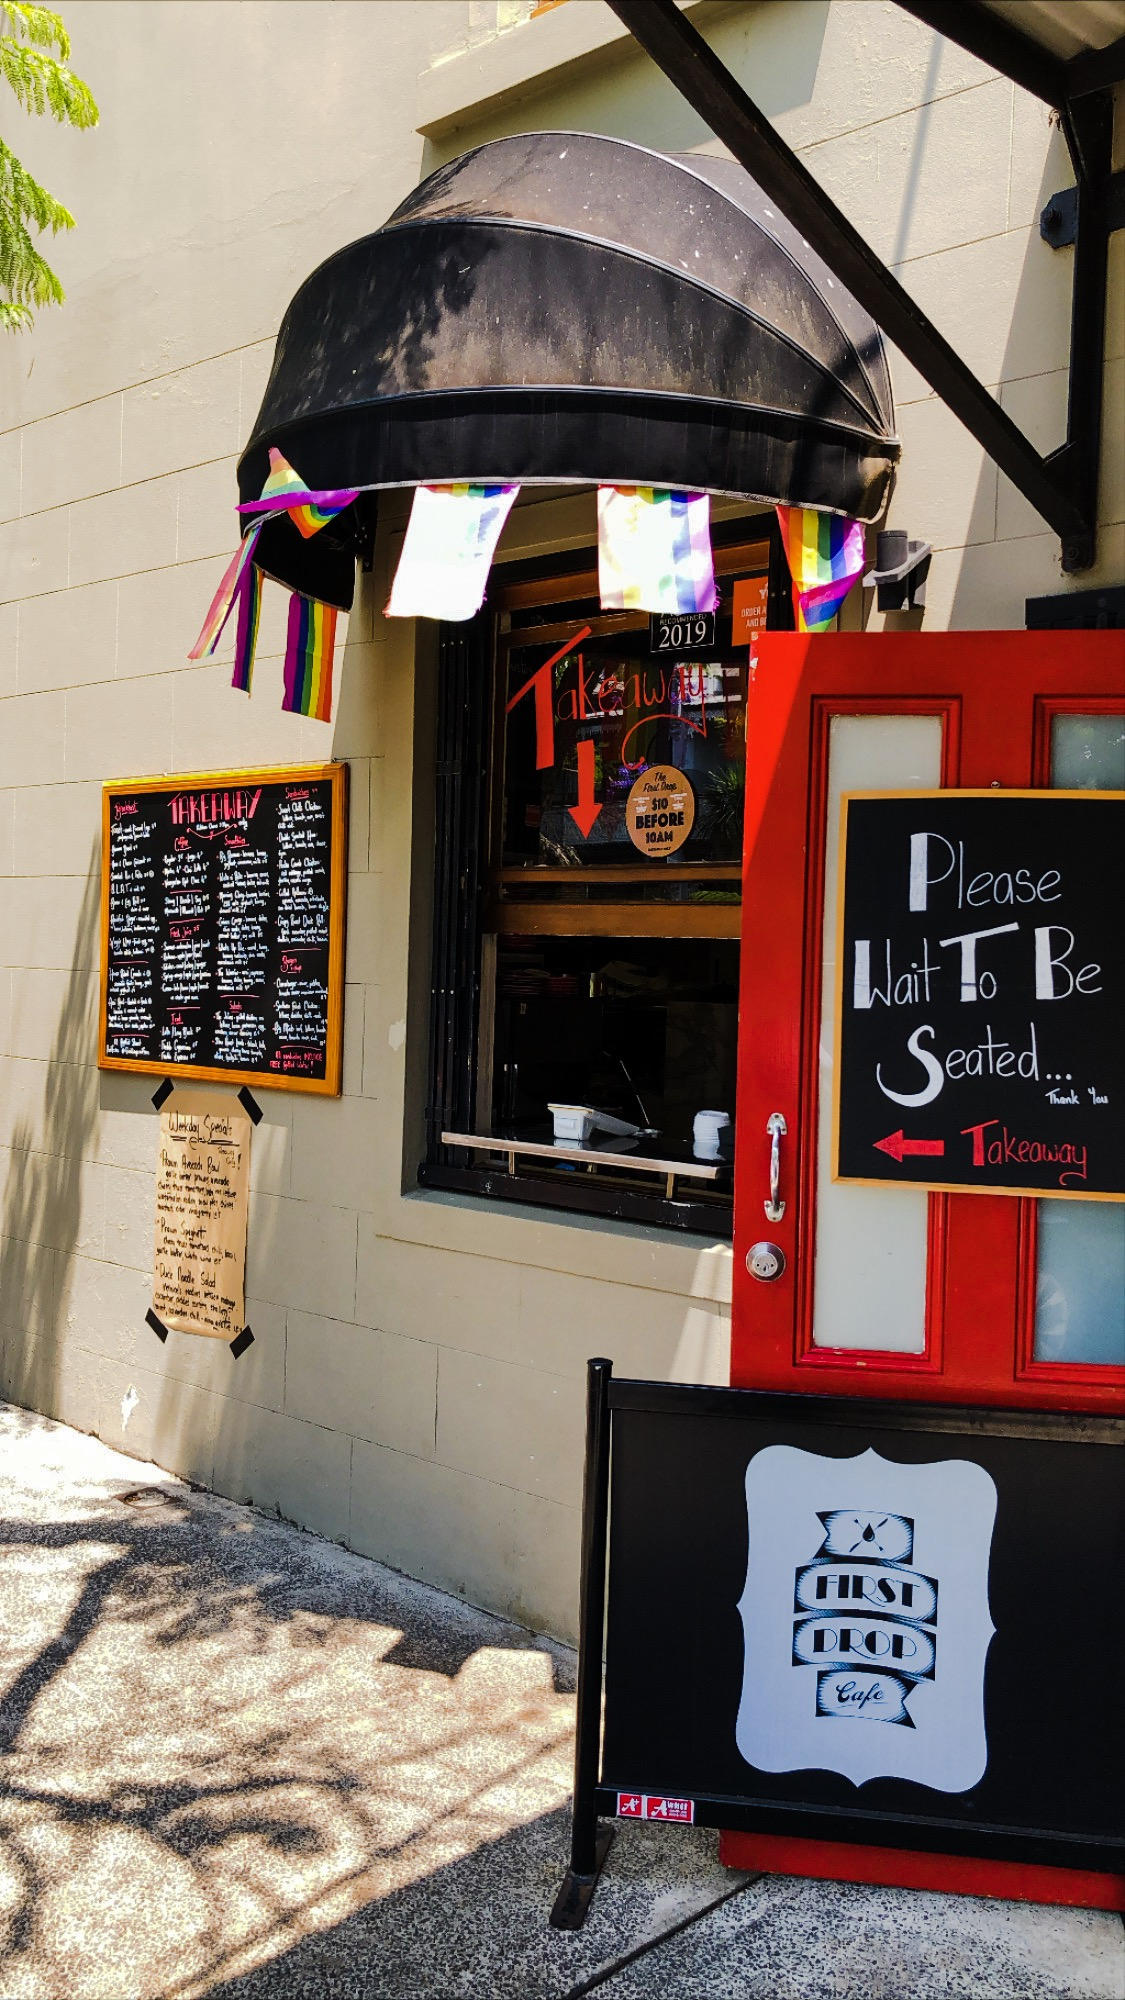 first-drop-cafe-redfern